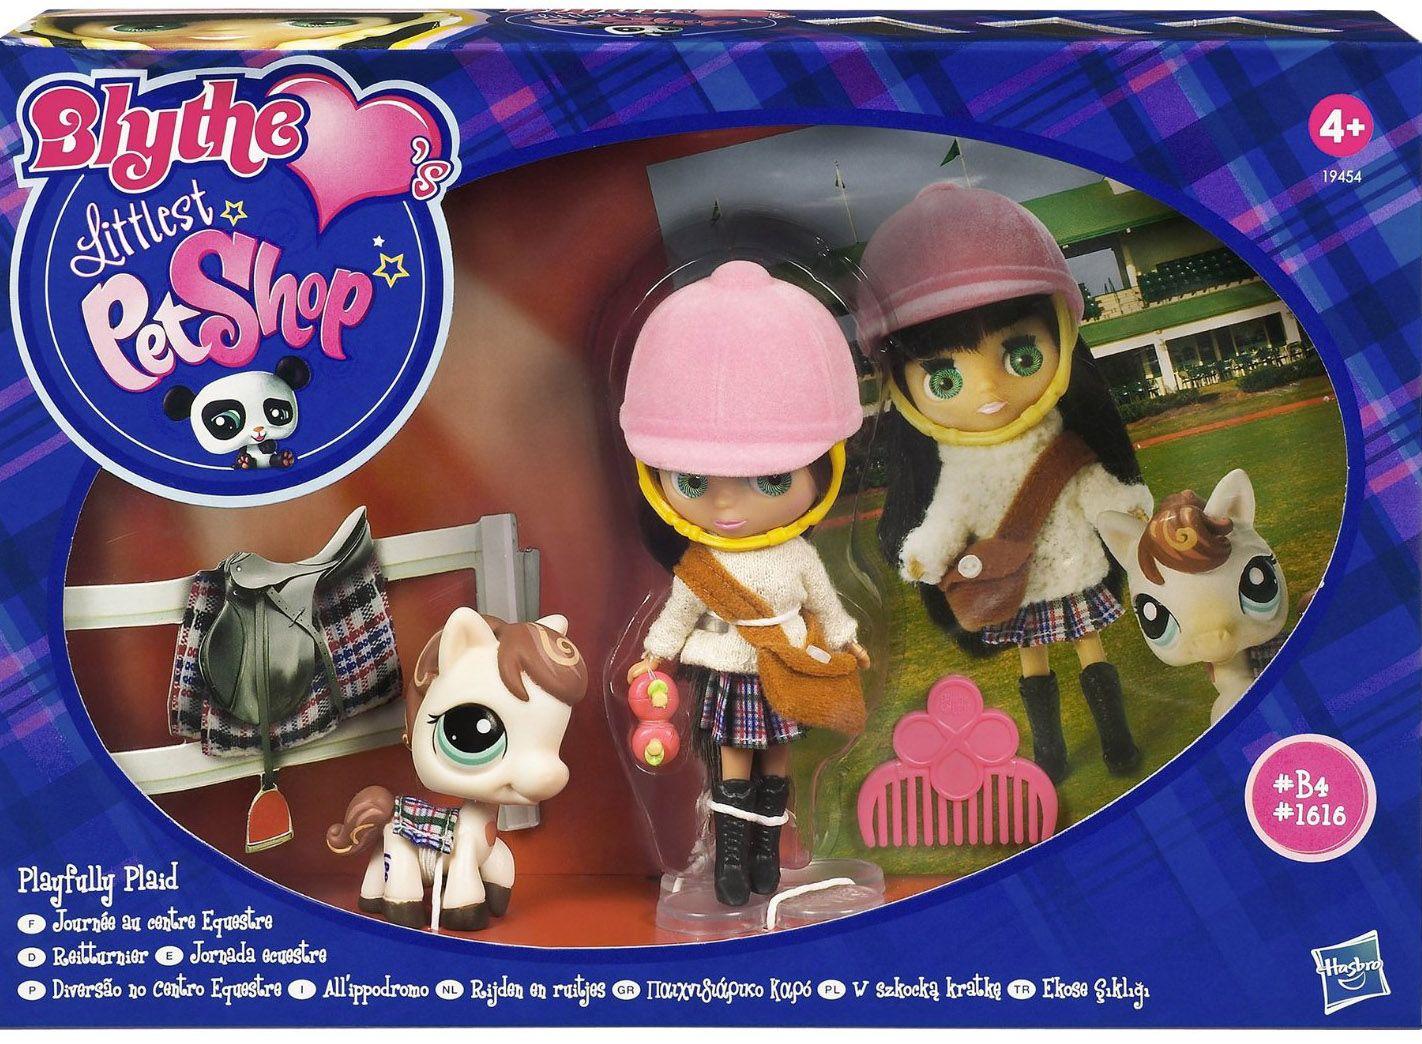 Littlest Pet Shop Blythe Playfully Plaid